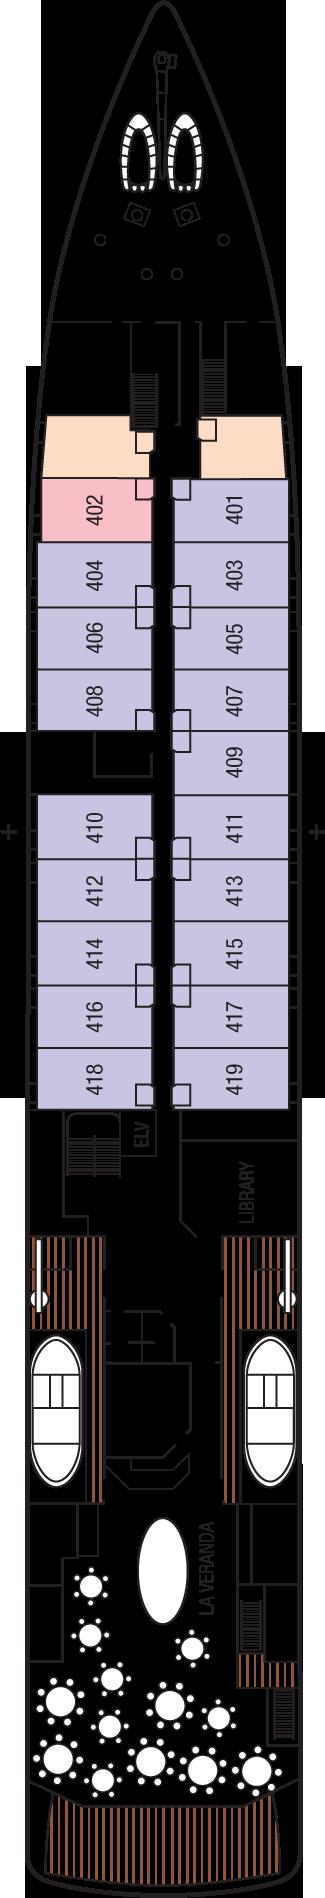 m/v Tere Moana Deck 4: Deck 4